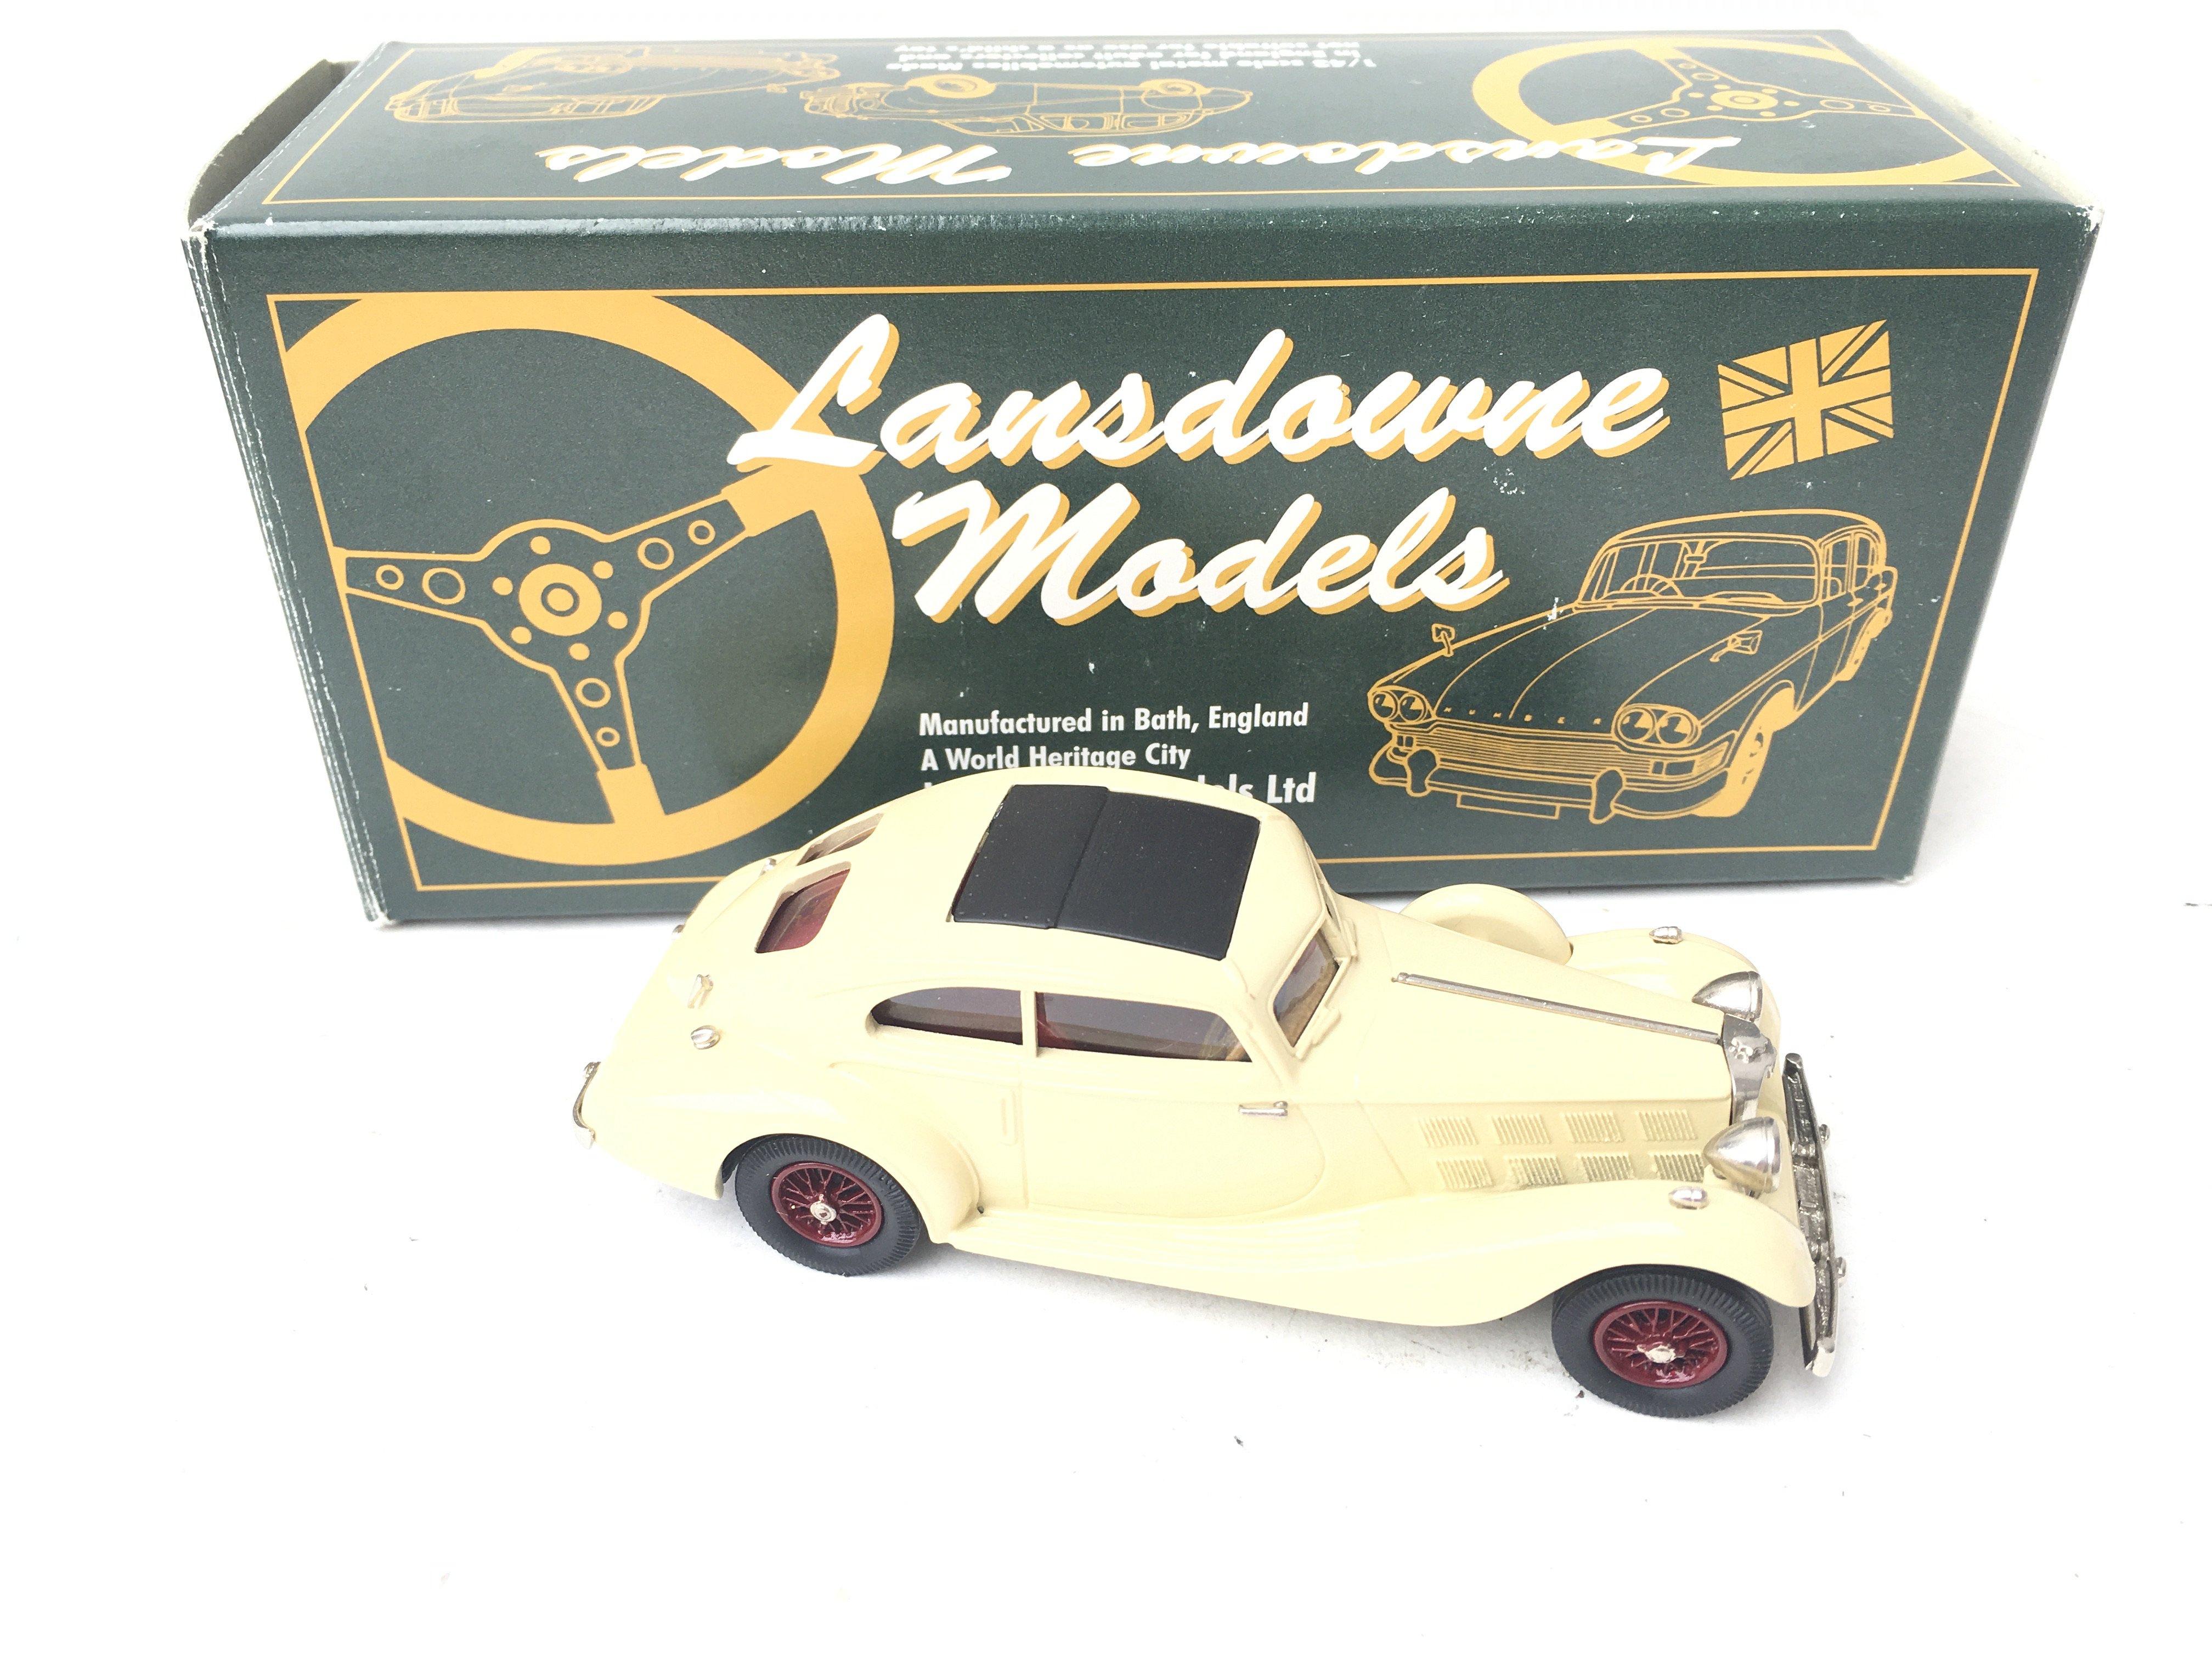 2 X Lansdowne Models. LDM 31 1947 Bristol 400 And - Image 3 of 3